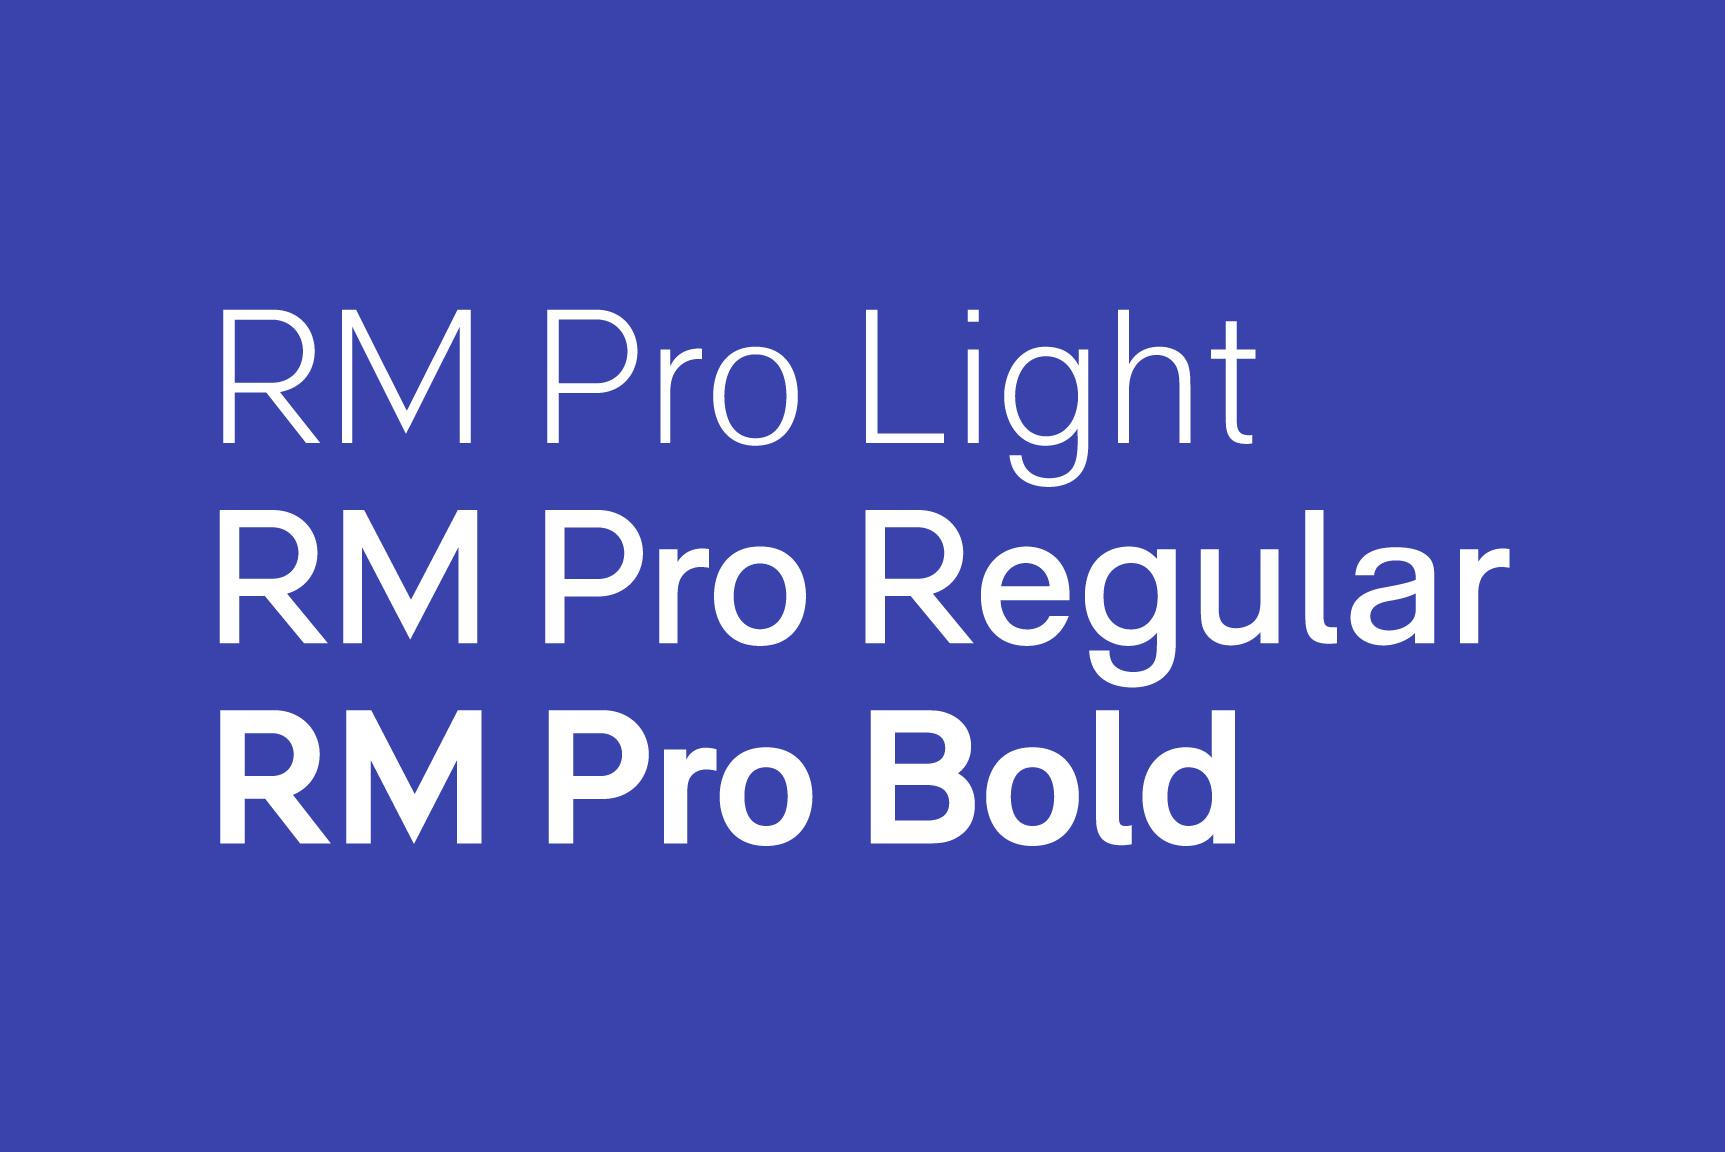 RM Pro